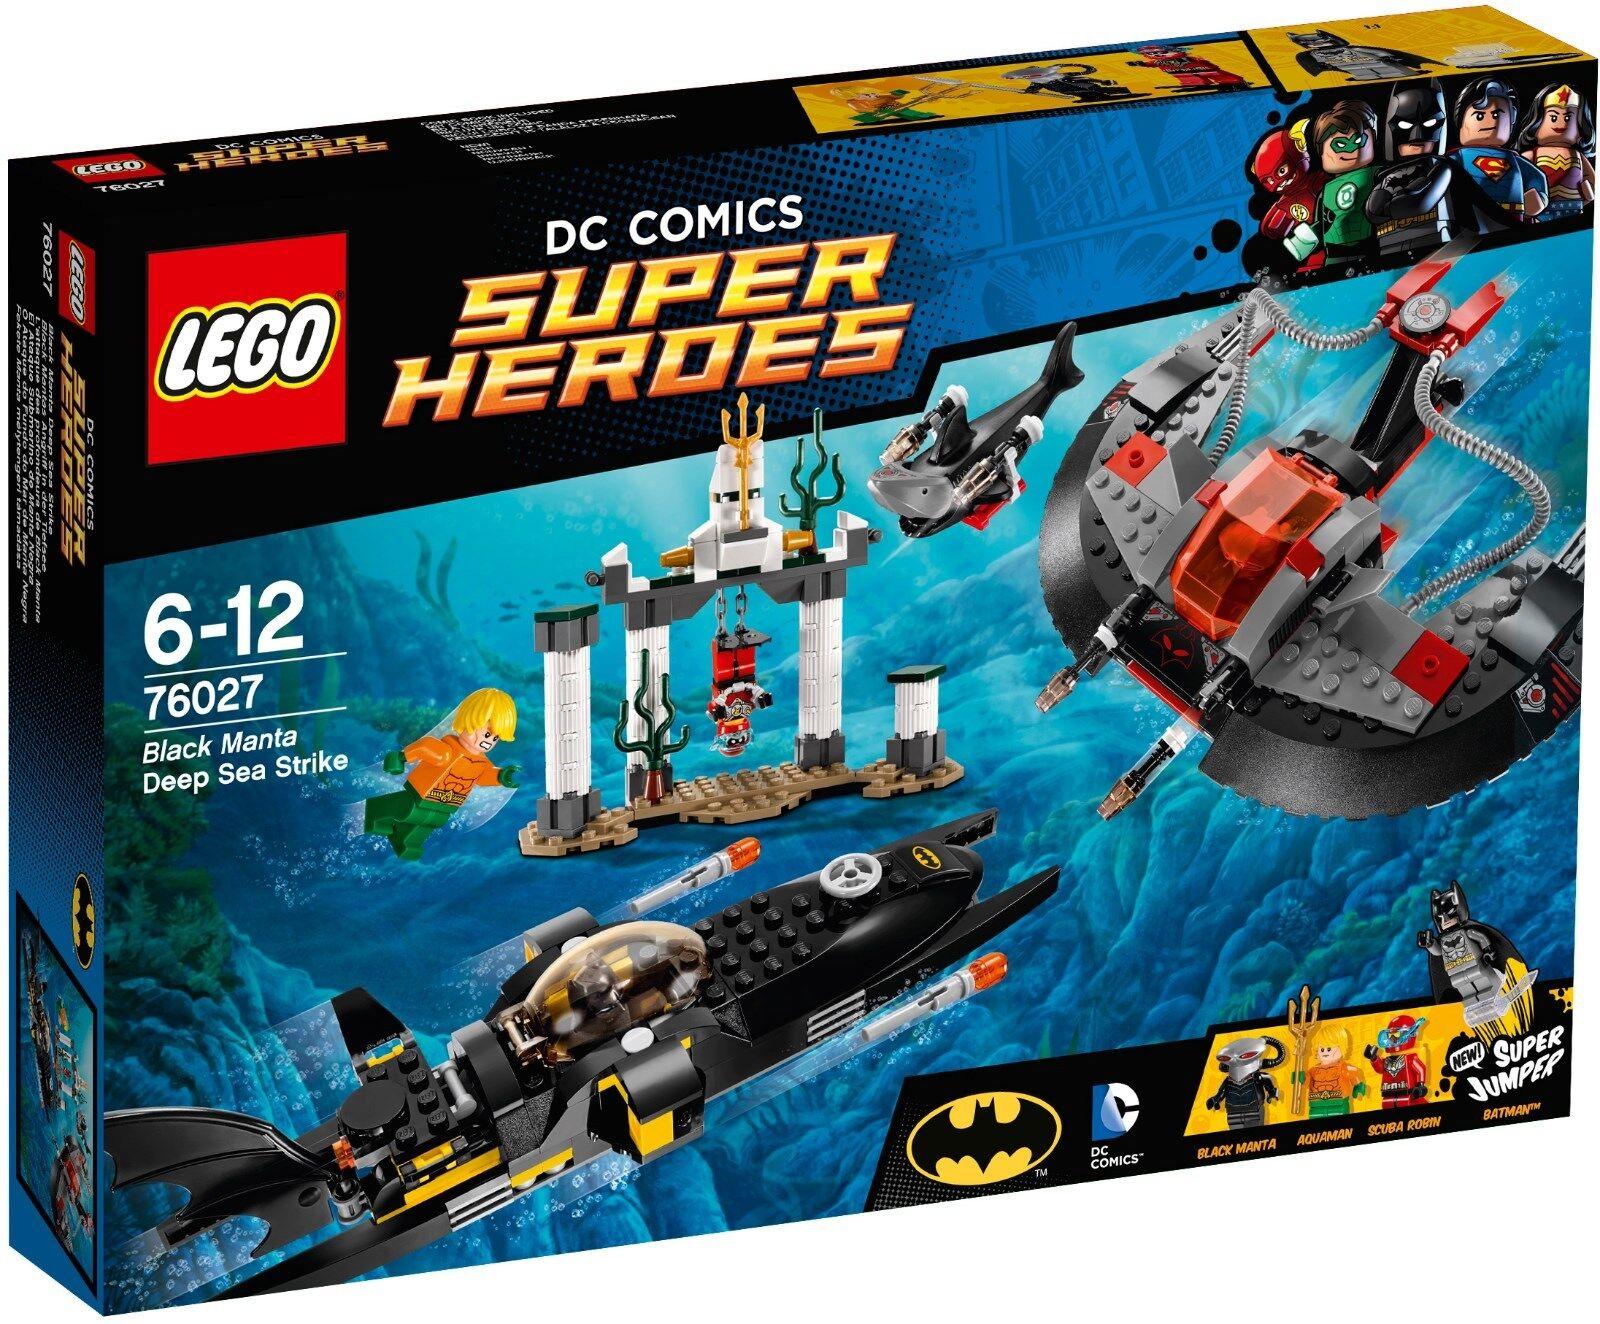 LEGO SUPER HEROES DC COMICS schwarz MANTA DEEP SEA STRIKE 76027 - NUEVO SIN ABRIR